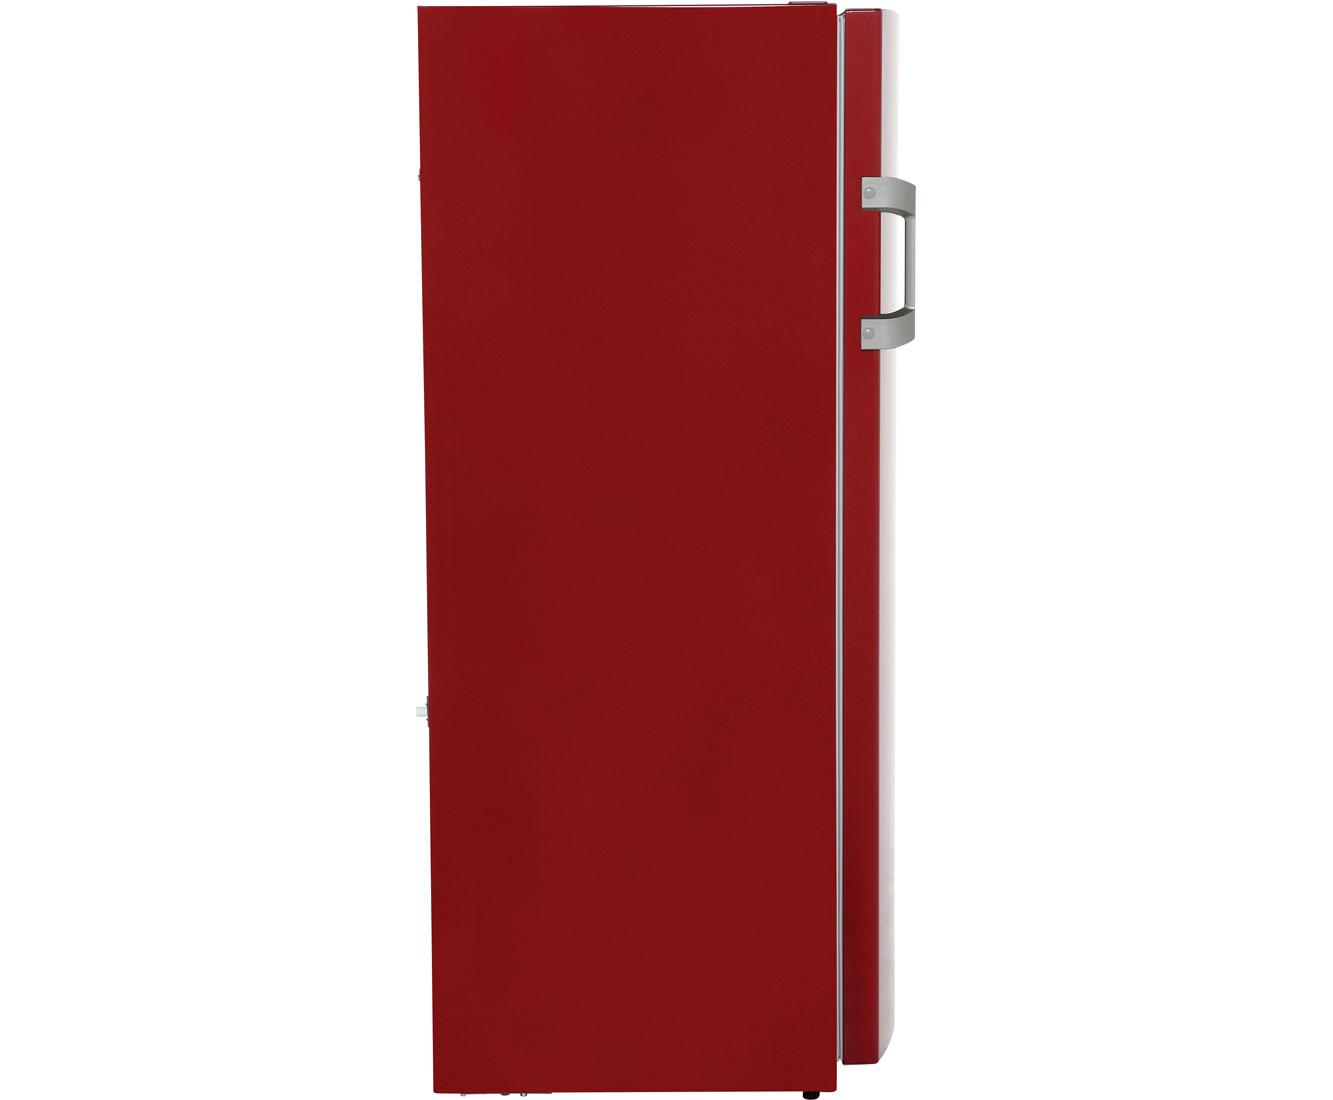 Gorenje Kühlschrank Edelstahl : Gorenje r6152bx kühlschrank edelstahl a